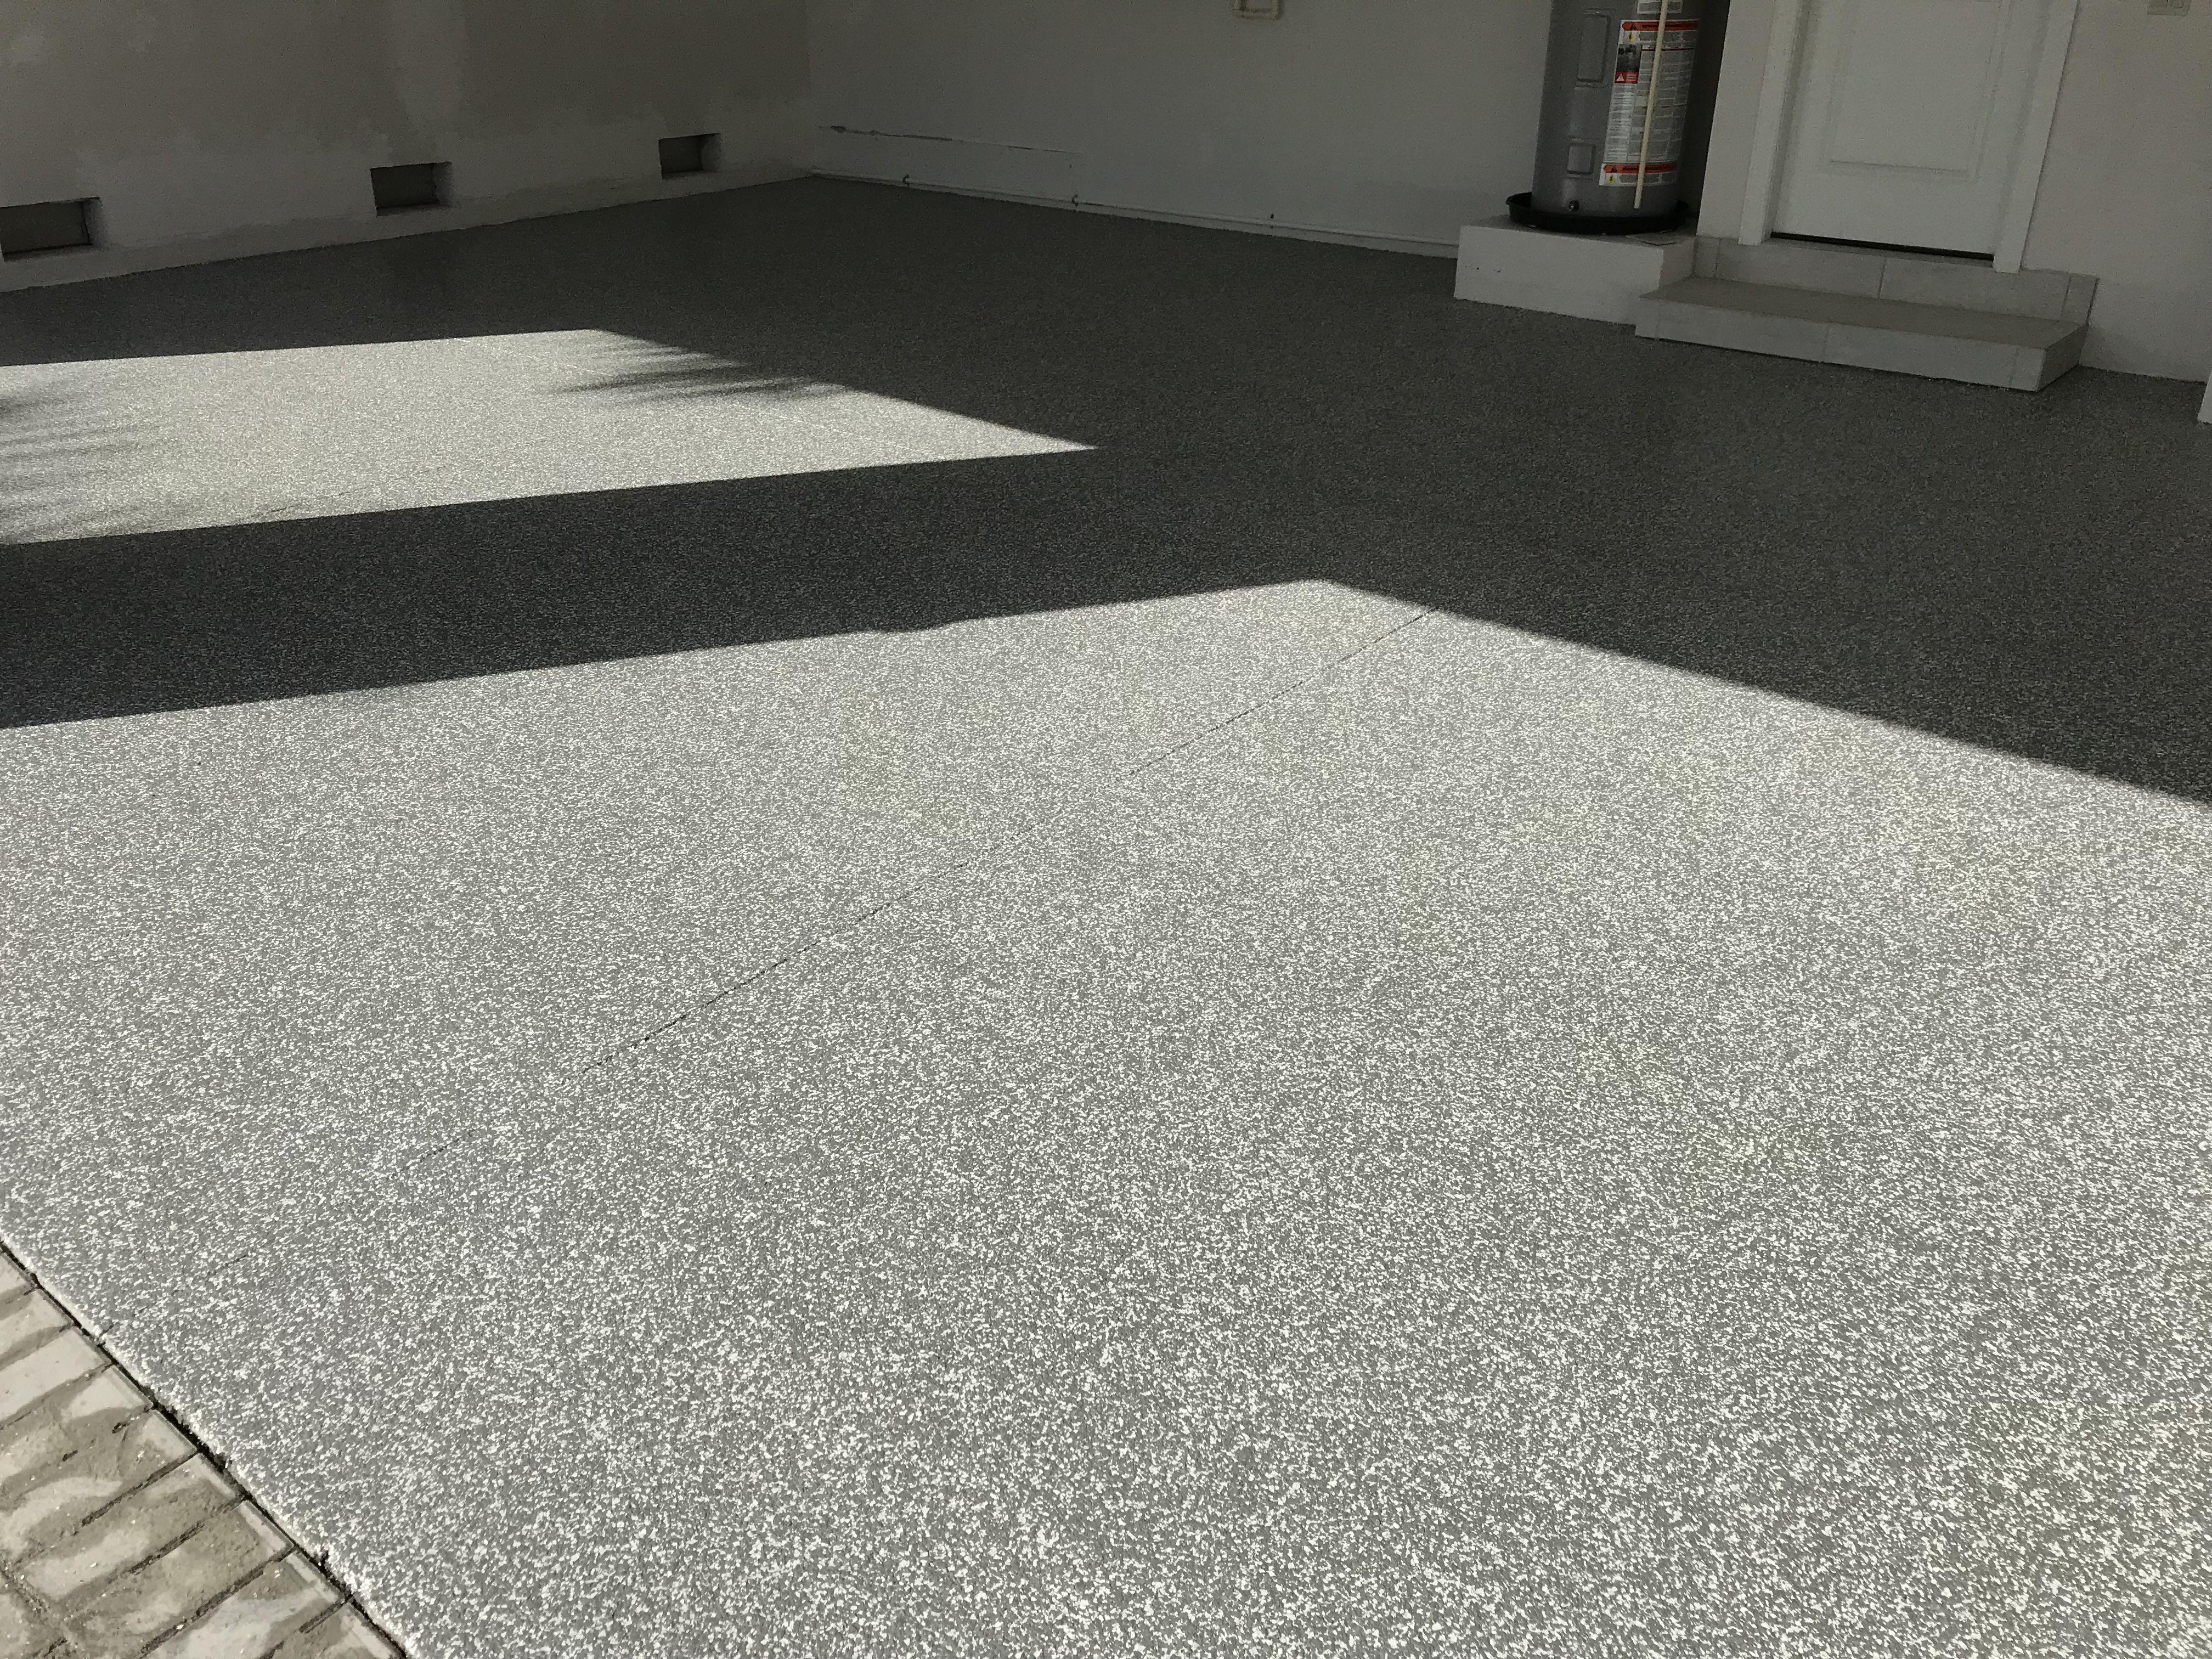 Pin by lisa spearman on epoxy floors pinterest epoxy floor